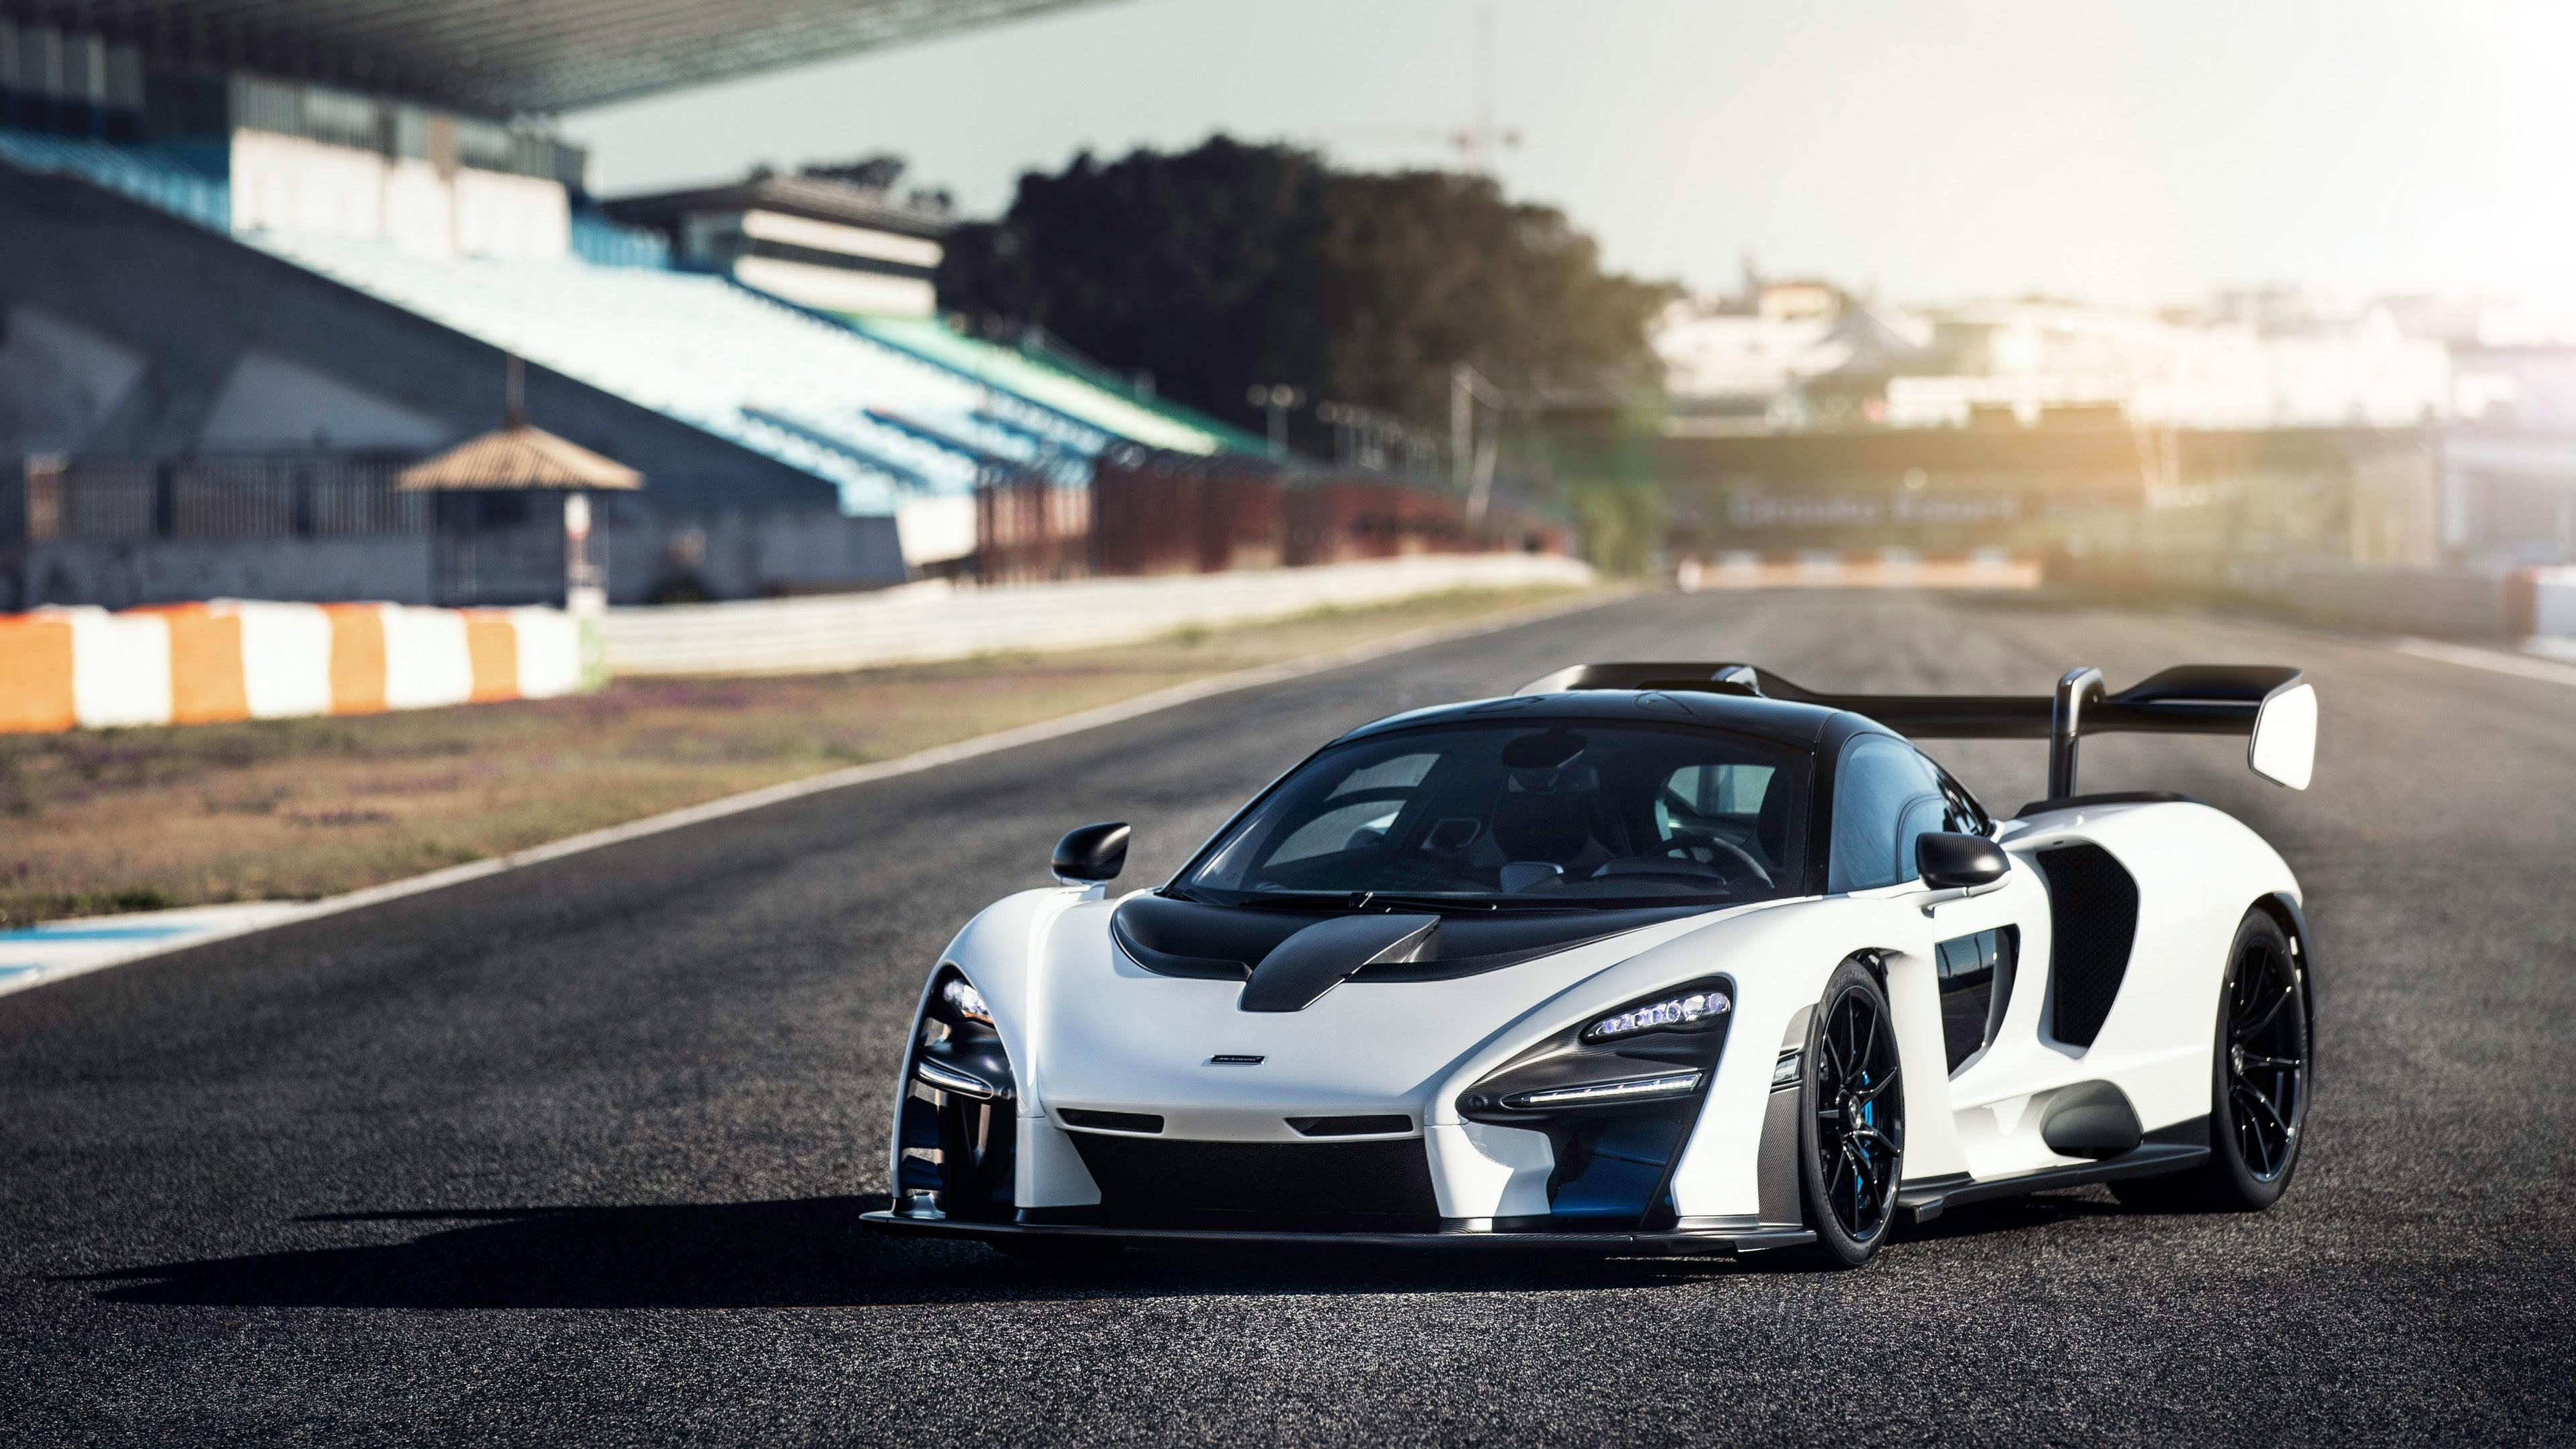 McLaren Senna Pure White 5K Wallpaper | HD Car Wallpapers ...